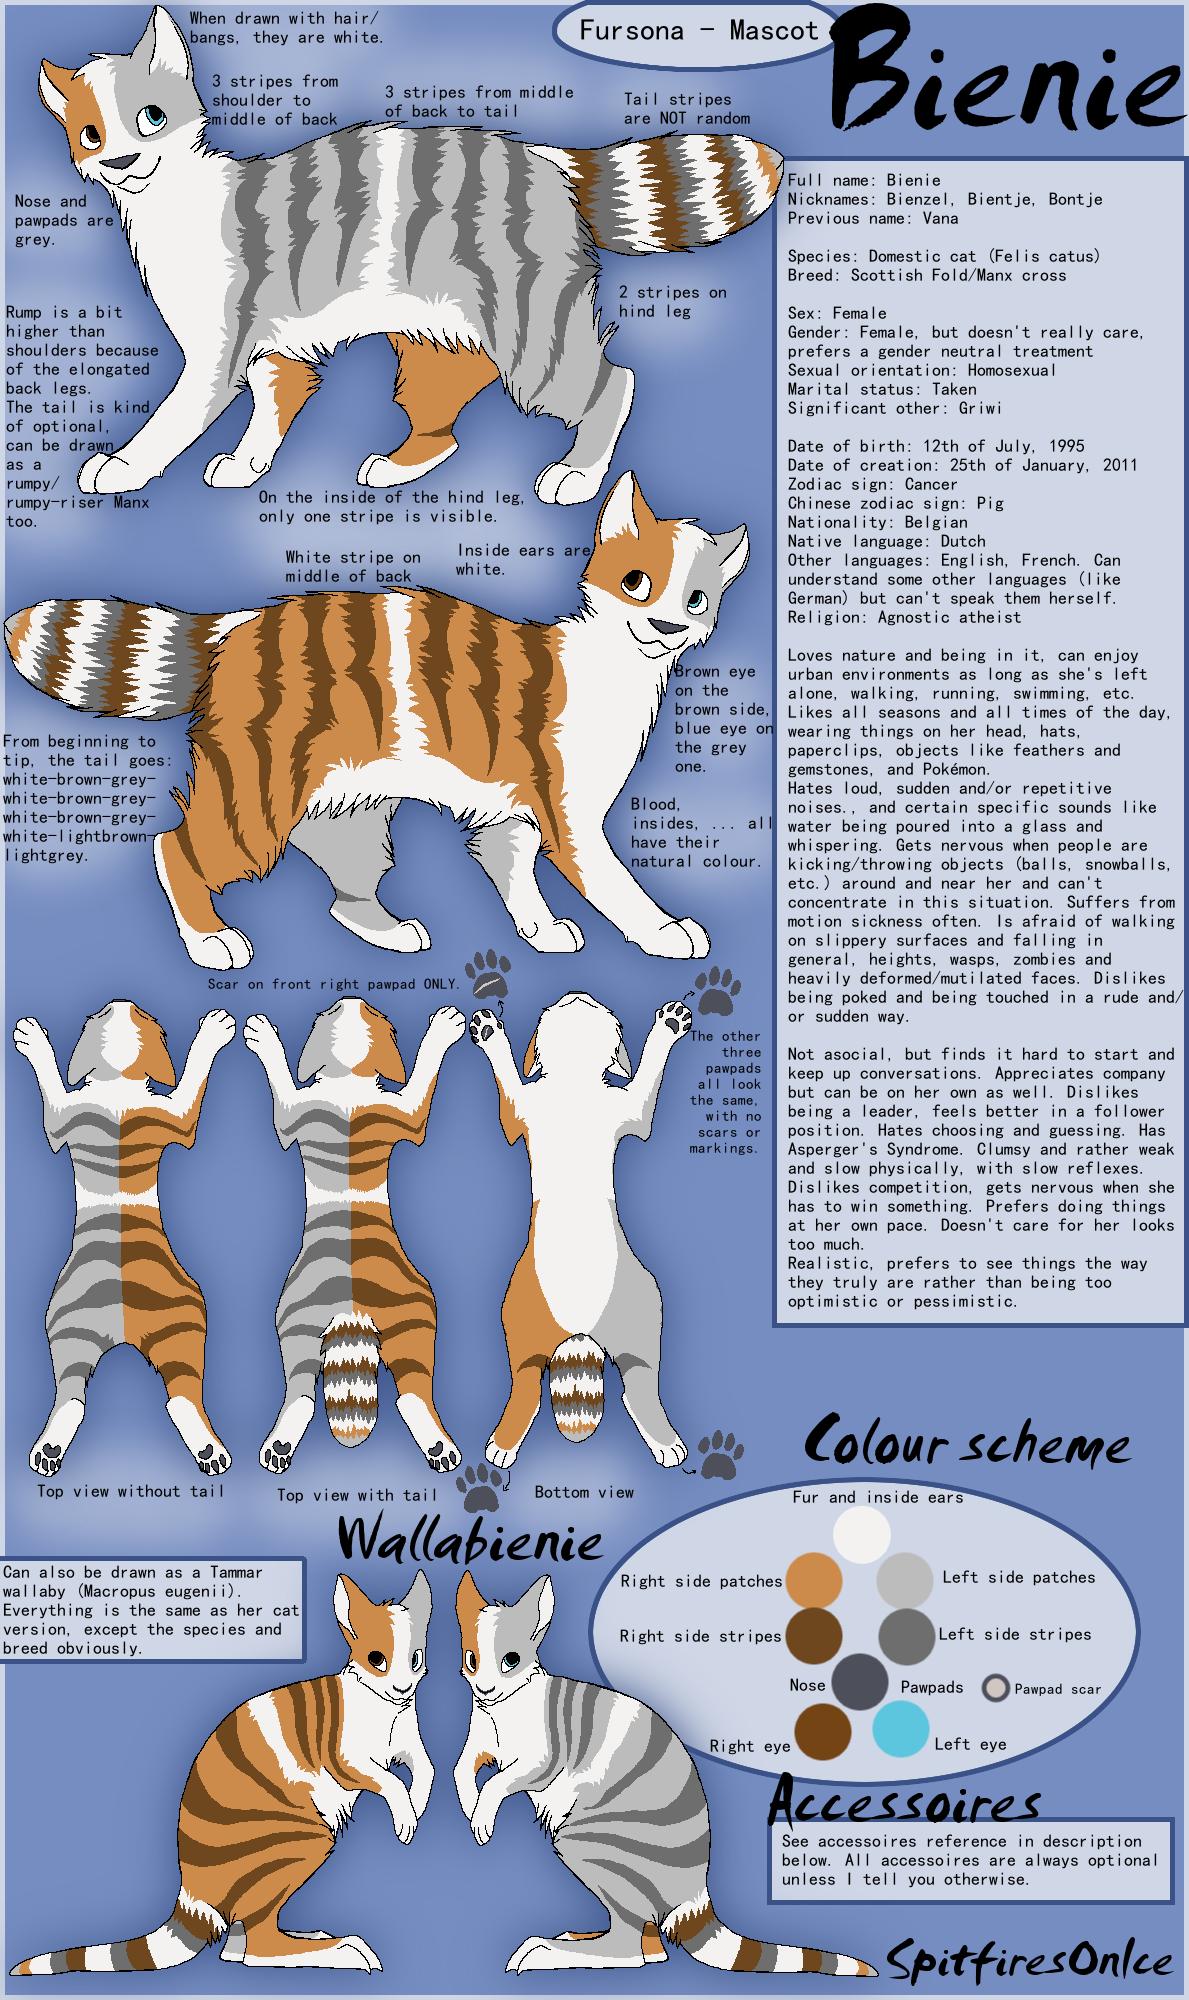 Bienie Reference Sheet 5